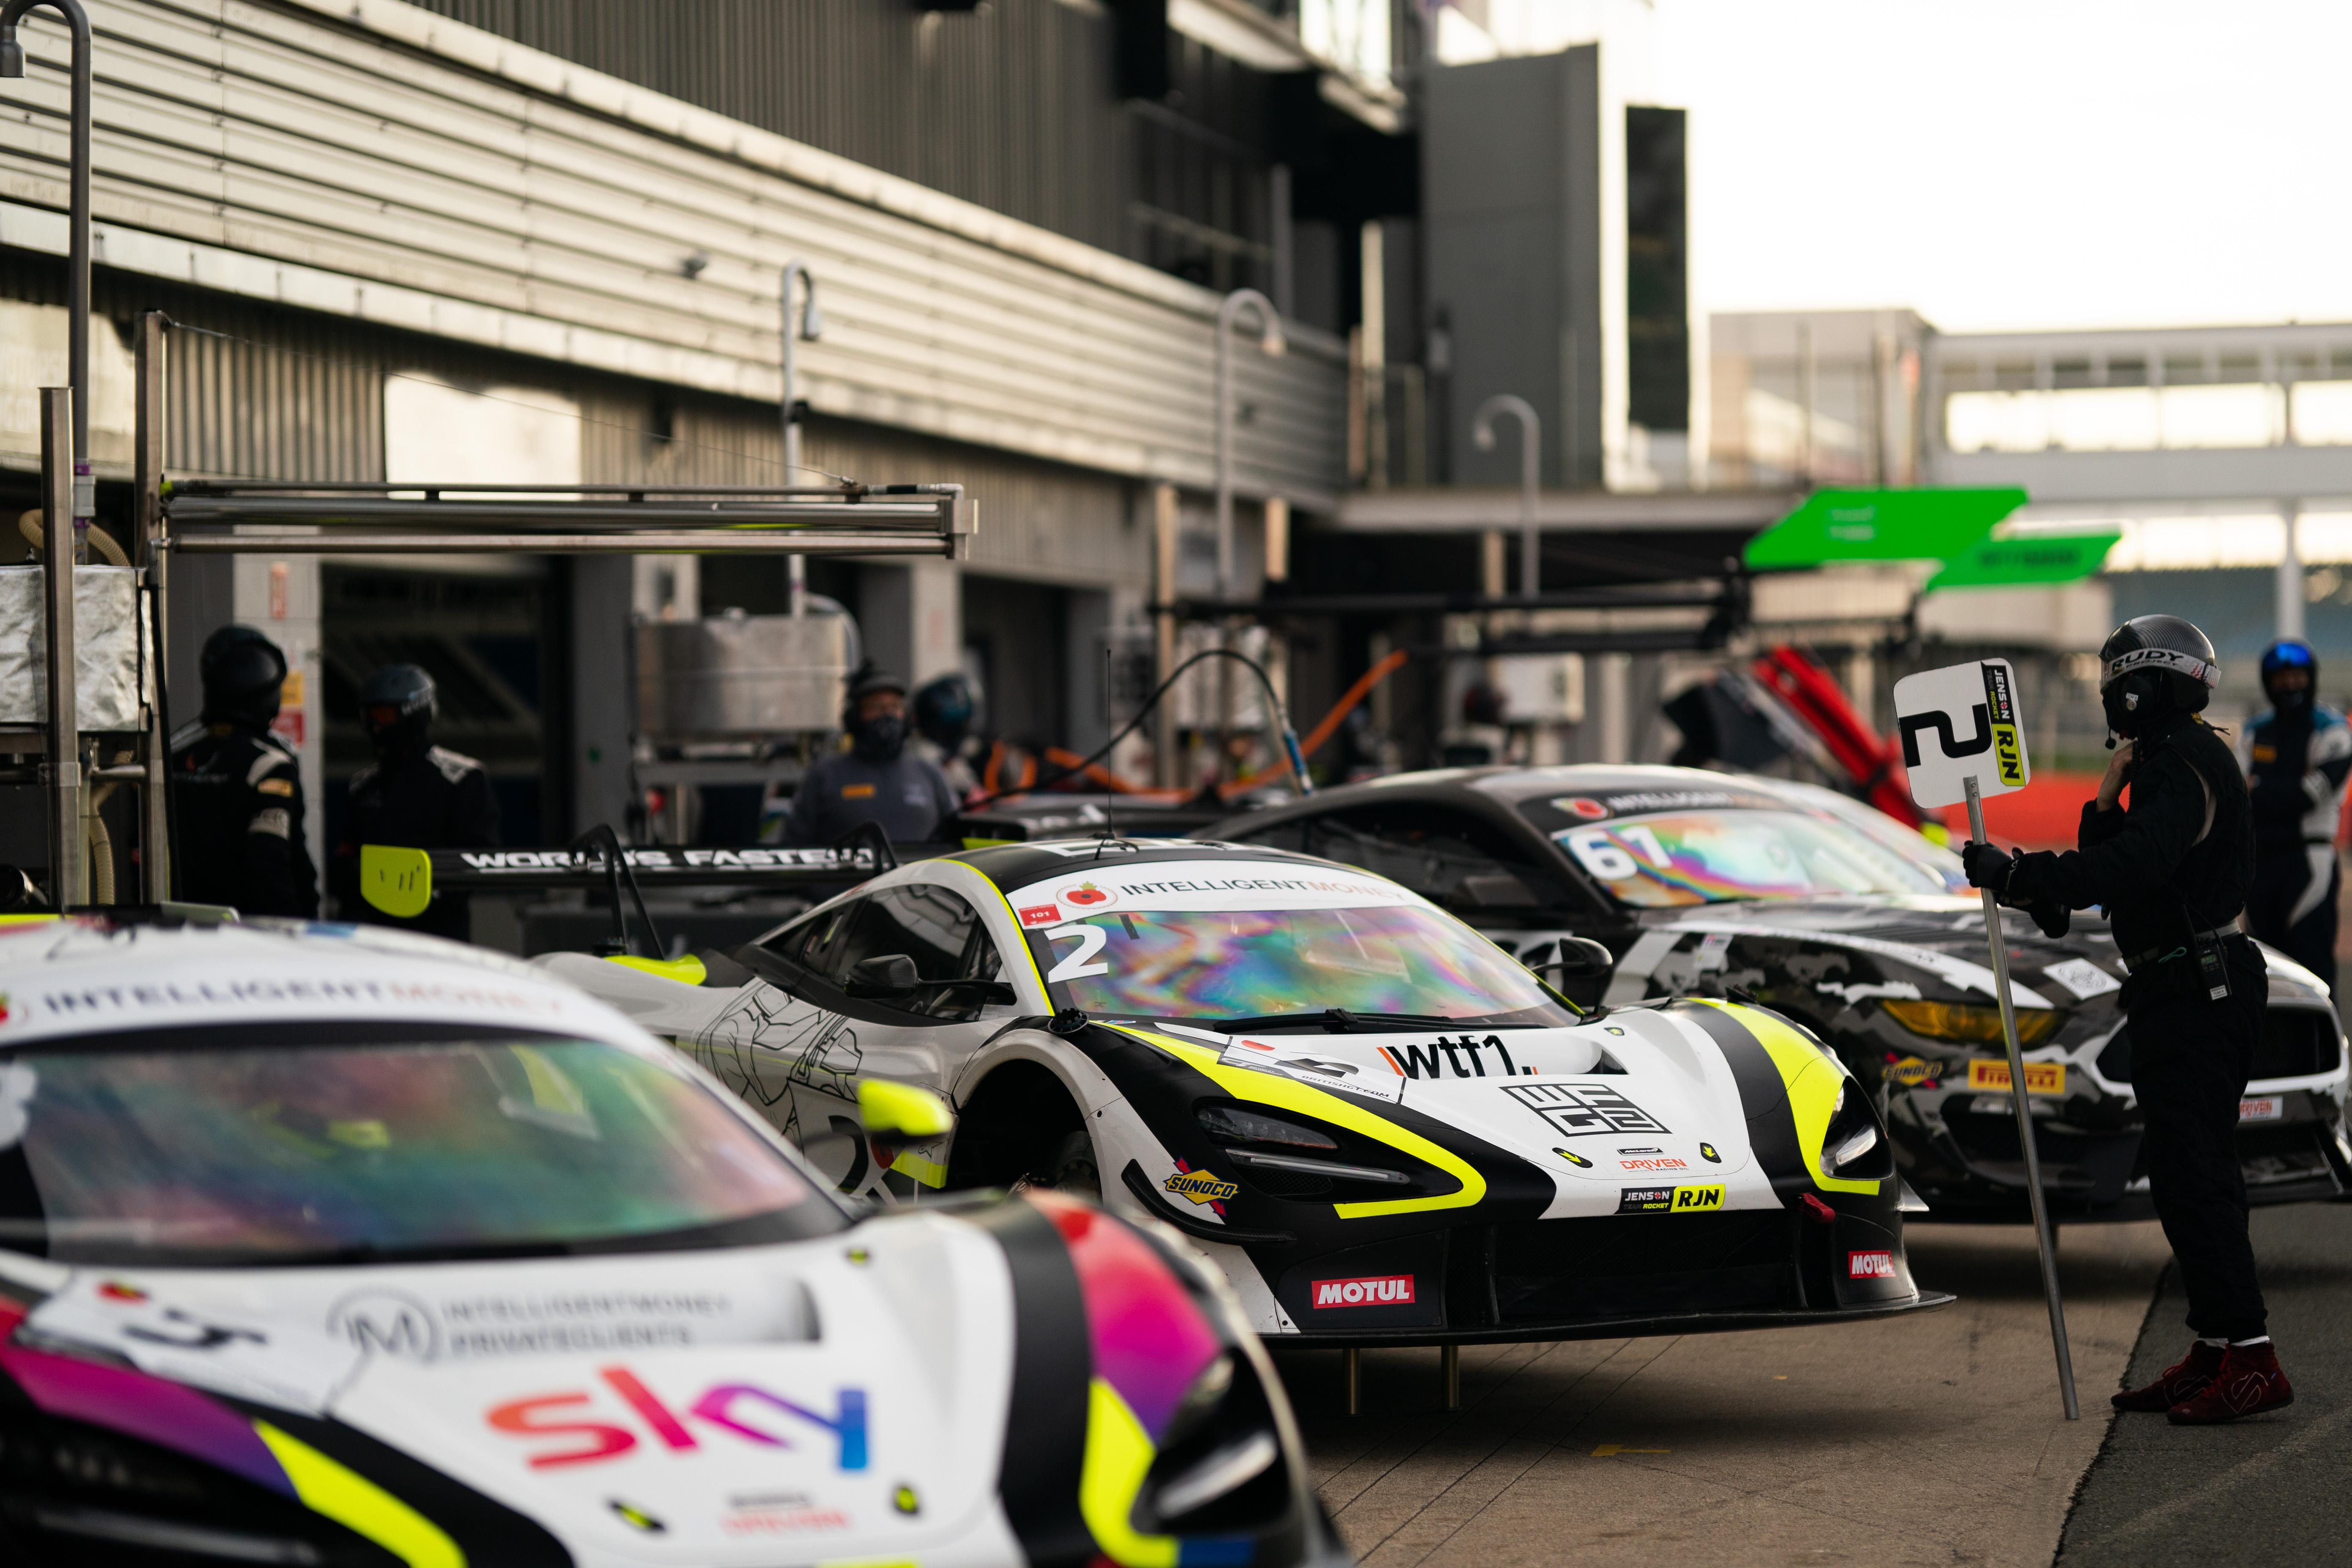 Jenson Team Rocket RJN McLarens Silverstone British GT 2020